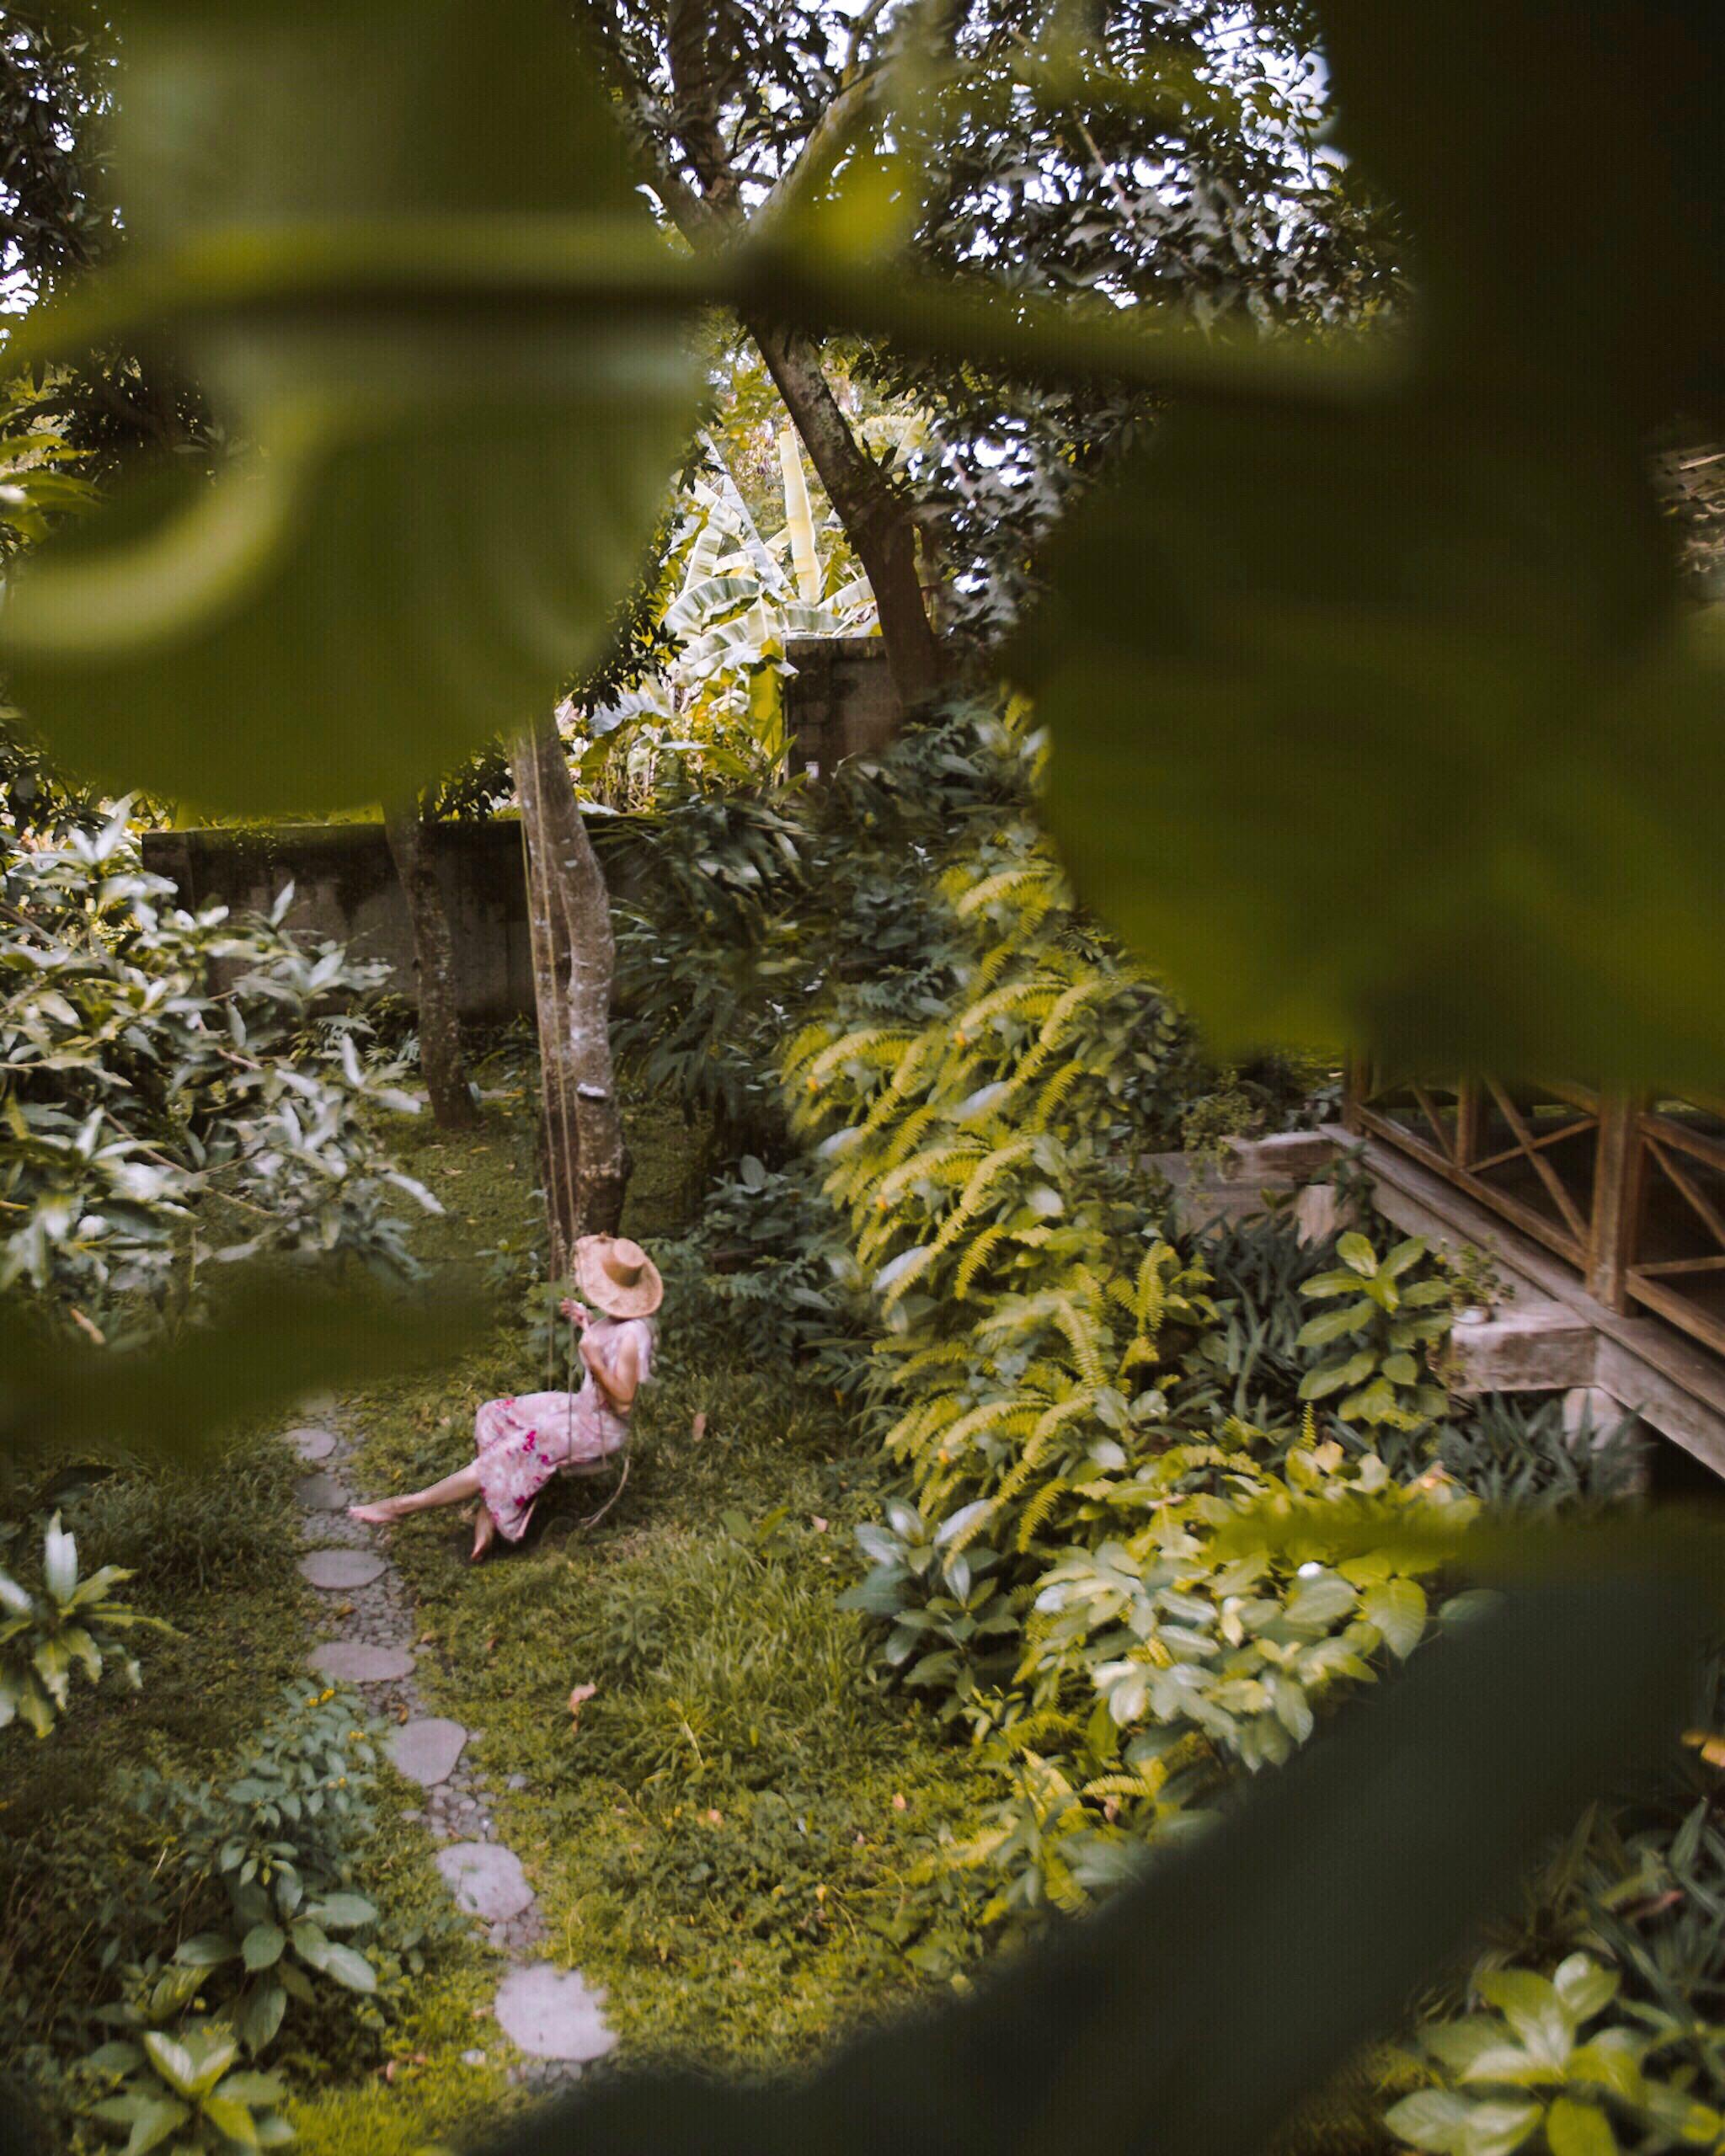 Vancouver-BC-Canada-Travel-Hospitality-Adventure-Commercial-Photographer-Indonesia-Bali-Emma-Rae.jpg